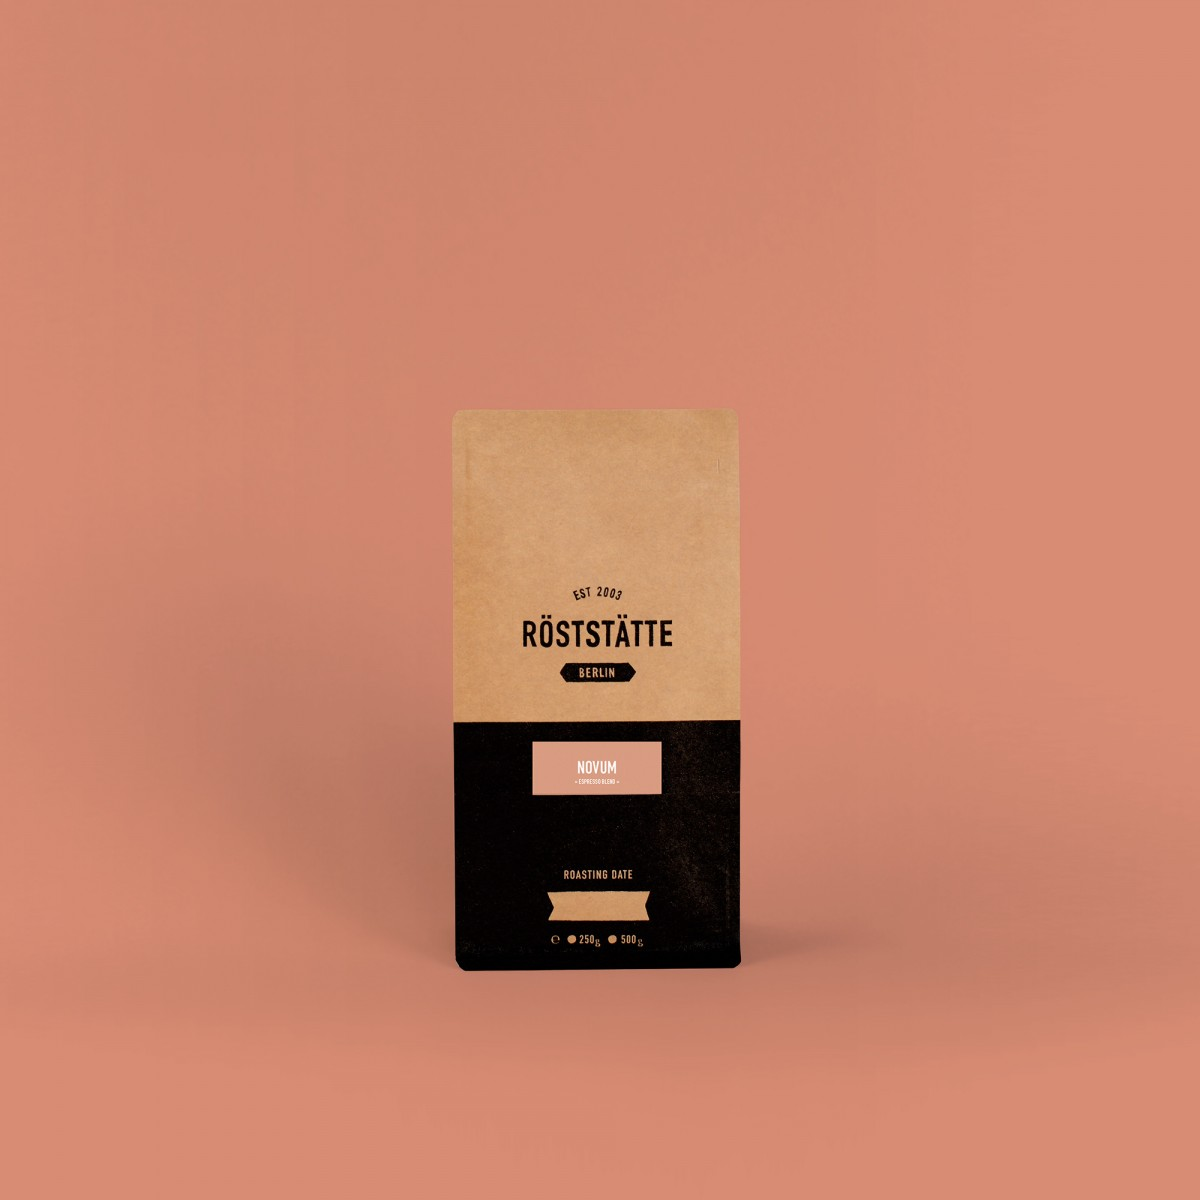 Röststätte Berlin Novum Espresso, 250g